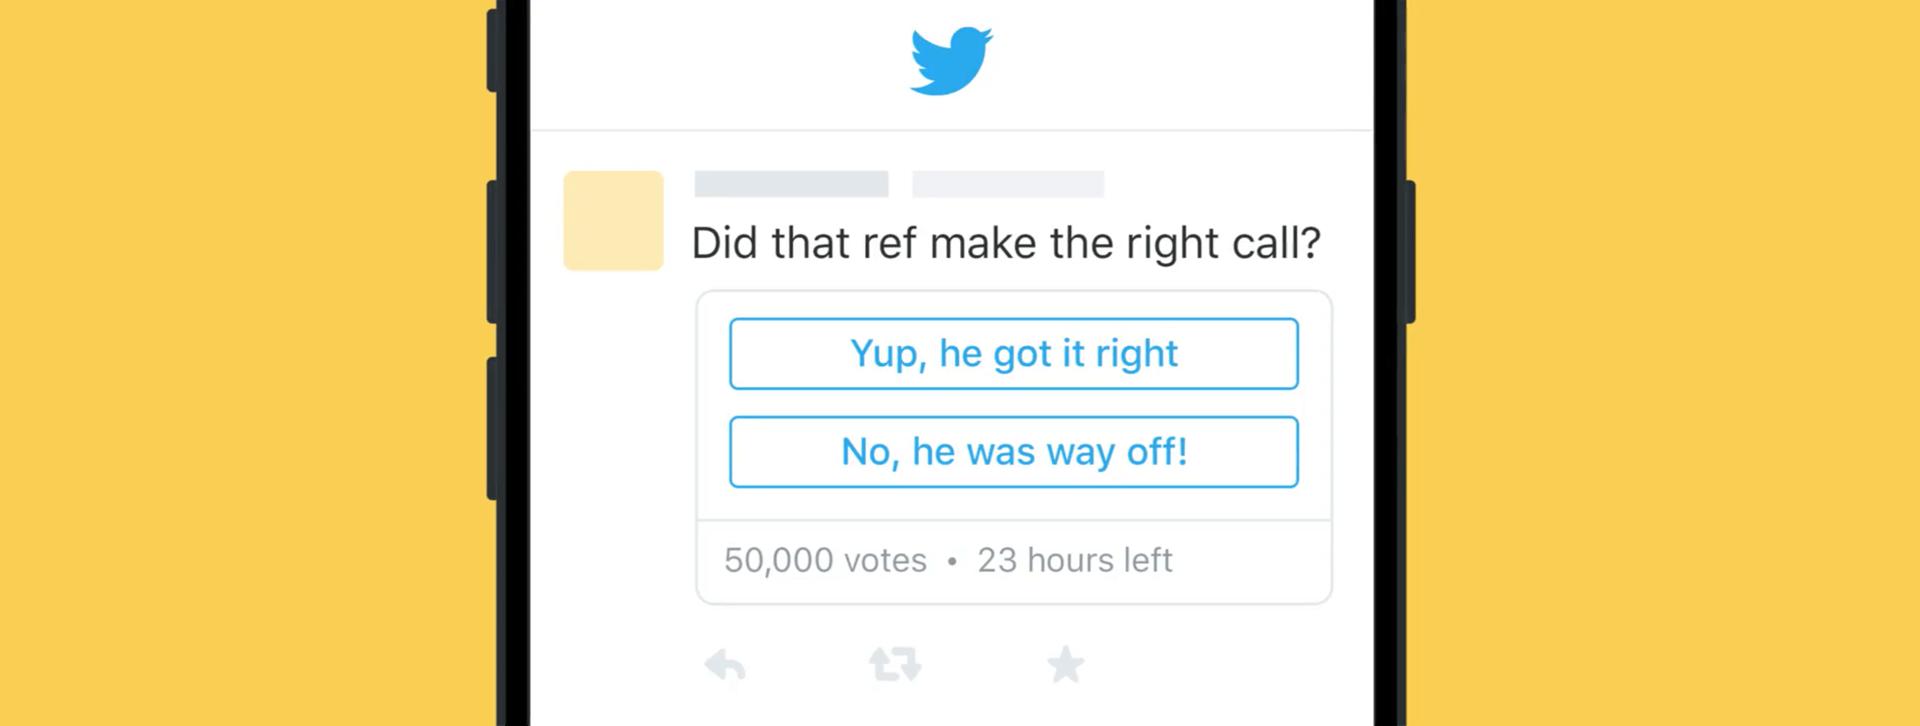 twittera yeni gelen anket özelliği